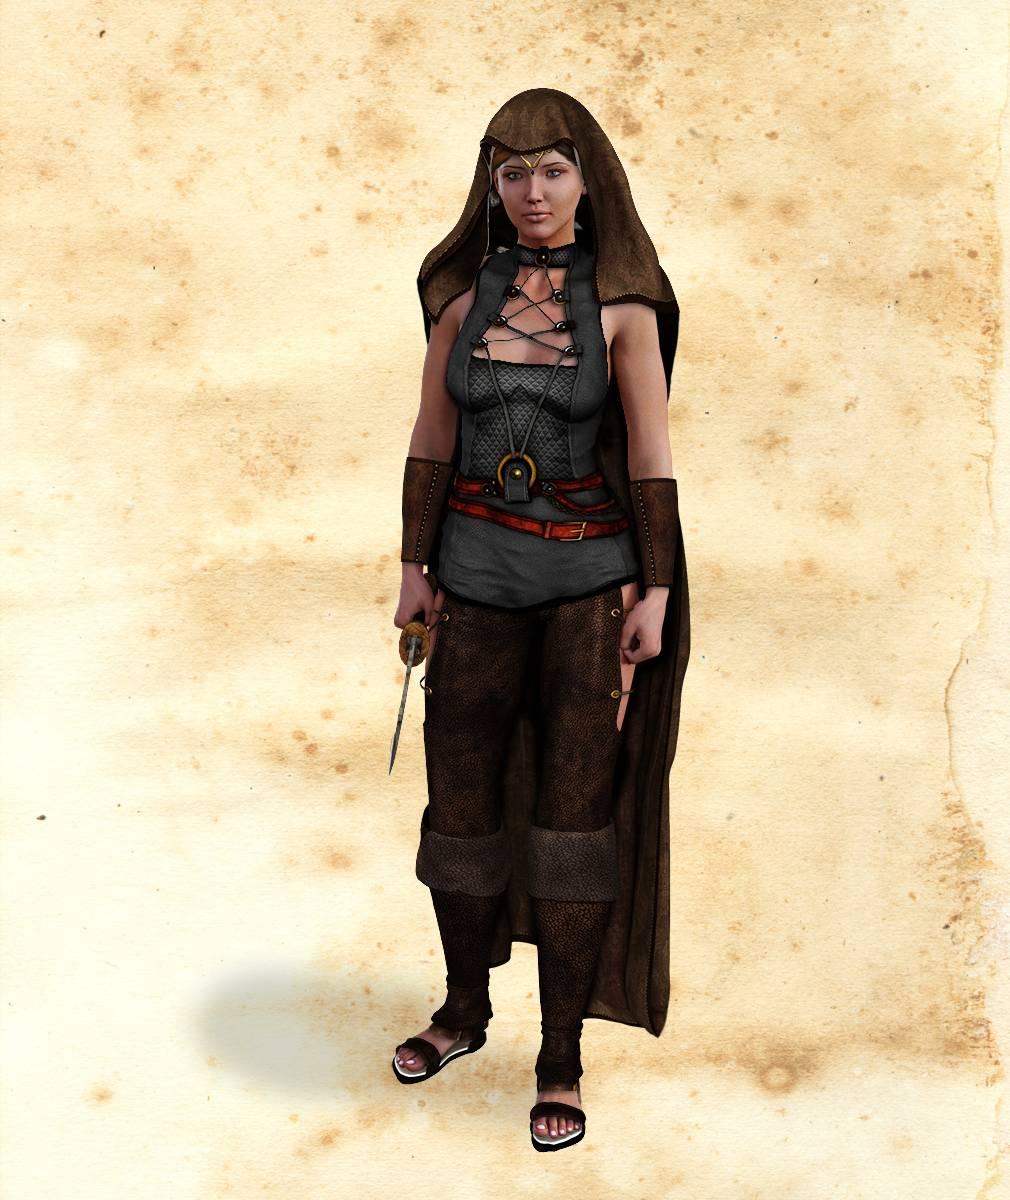 ePic Character Generator Season 2 Female Adventurer 1 Screenshot 02